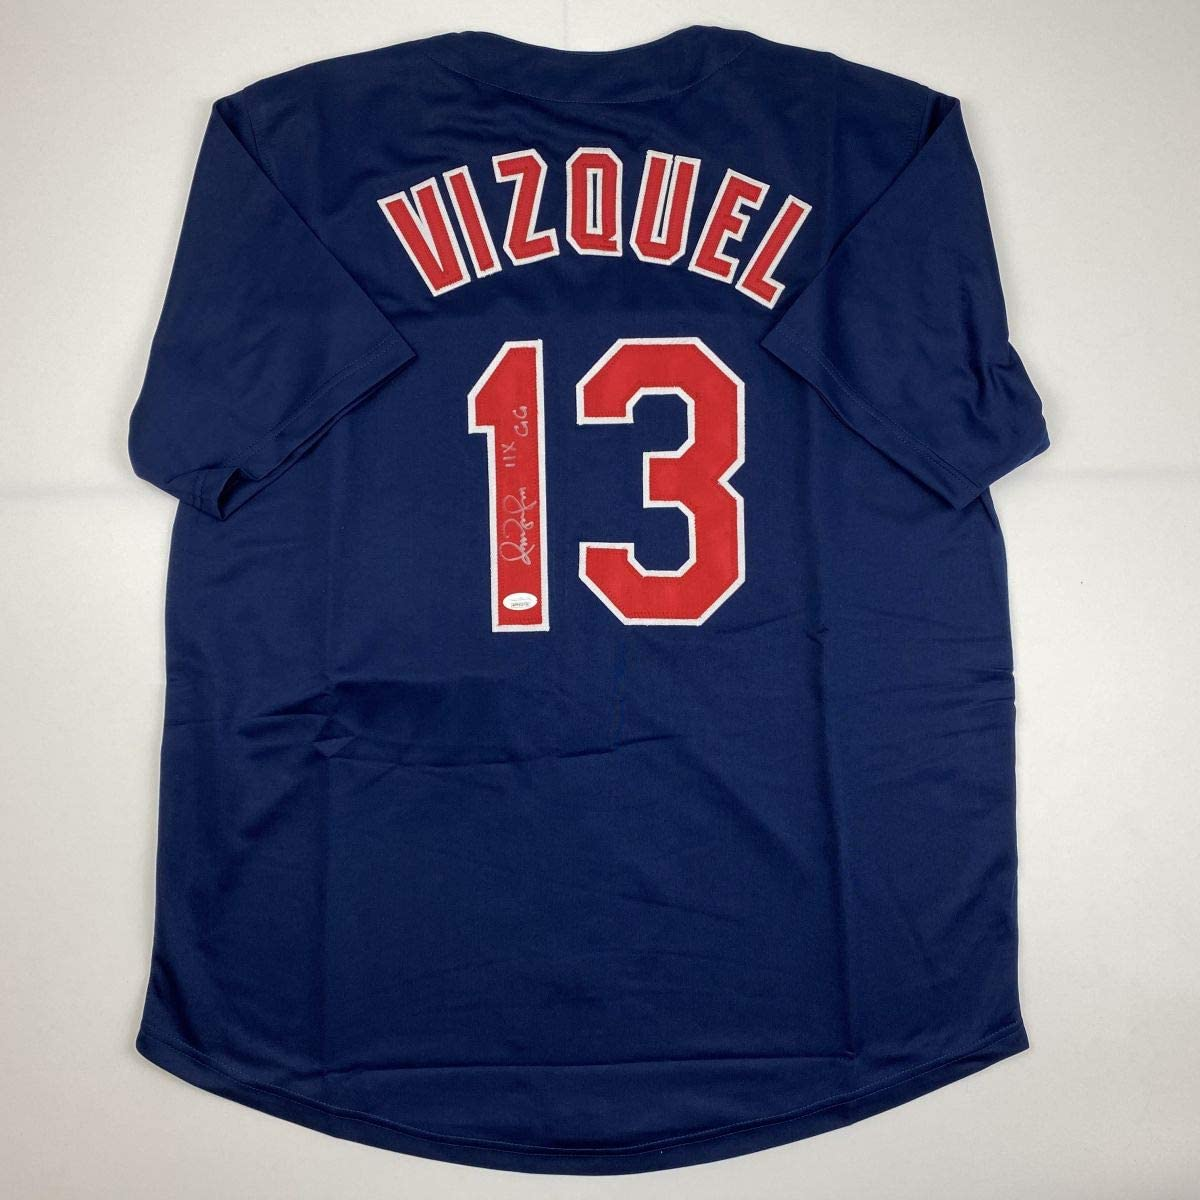 Autographed/Signed Omar Vizquel 11x GG Cleveland Blue Baseball Jersey JSA COA